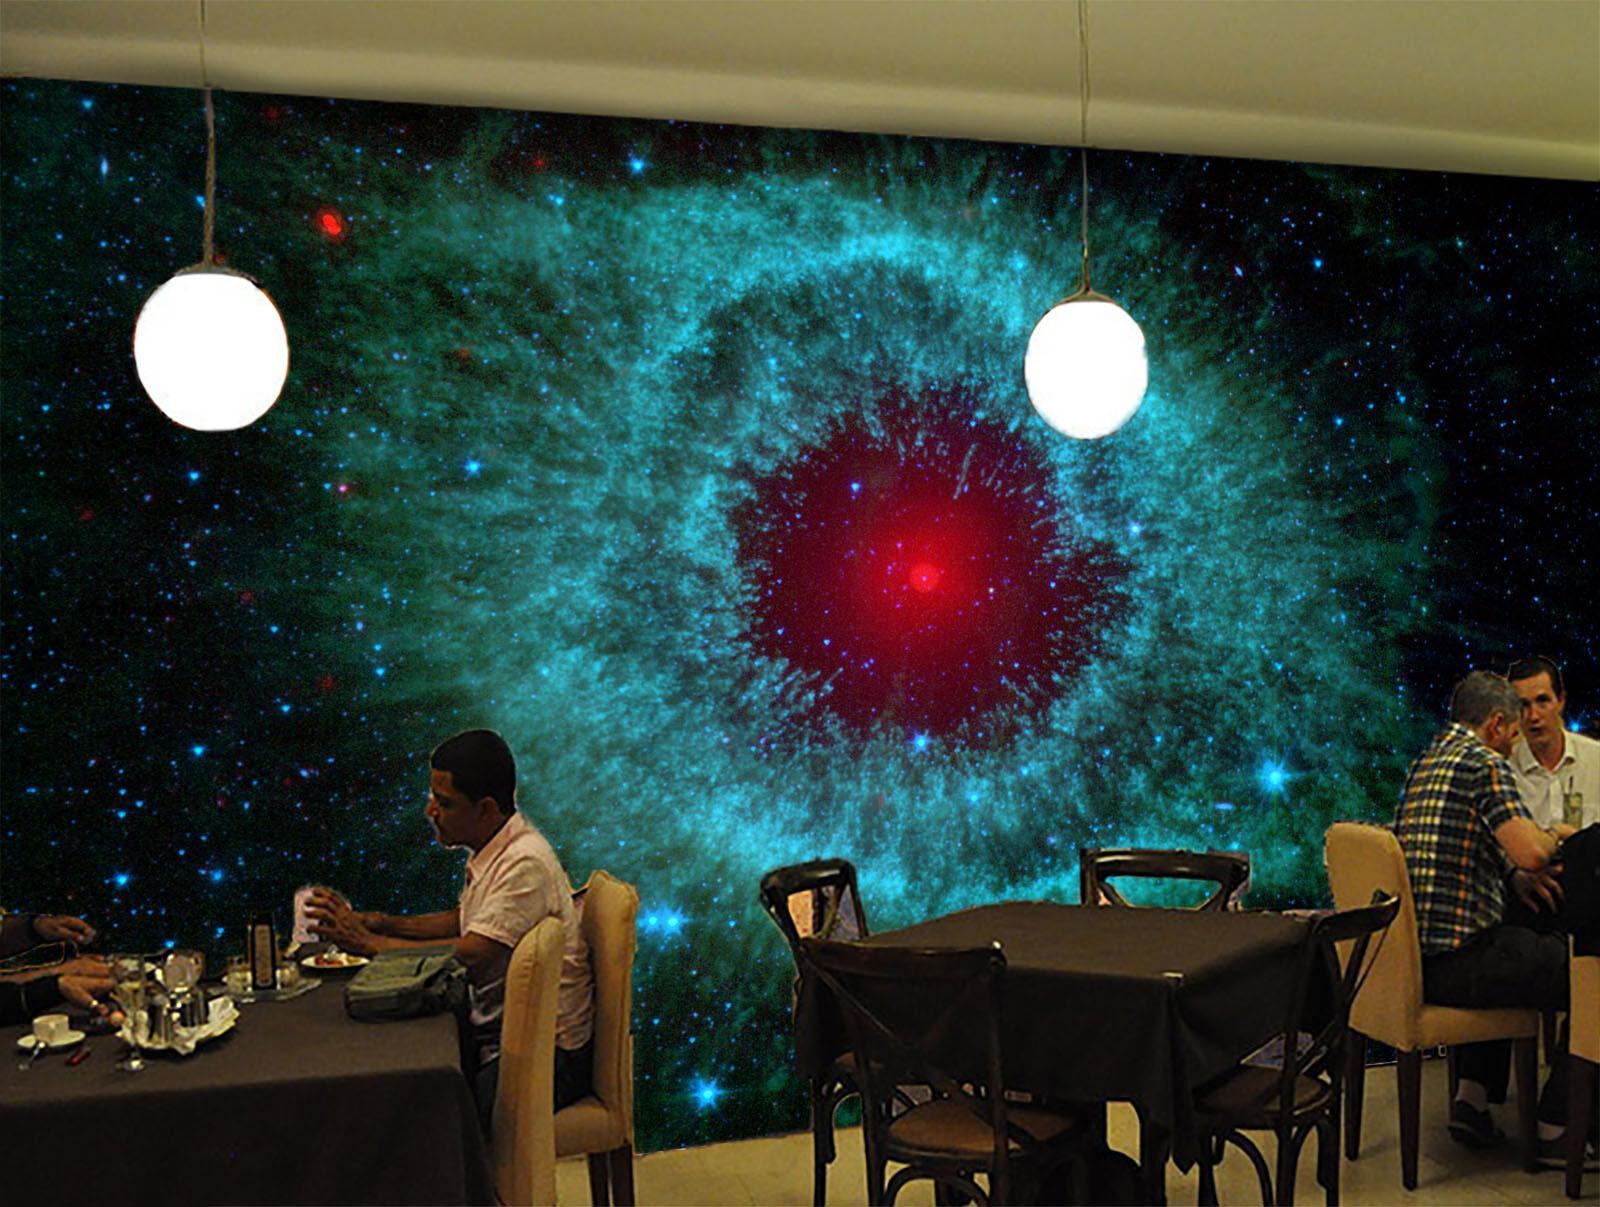 3D Die rede Iris bluees Licht Fototapeten Wandbild Fototapete BildTapete Familie